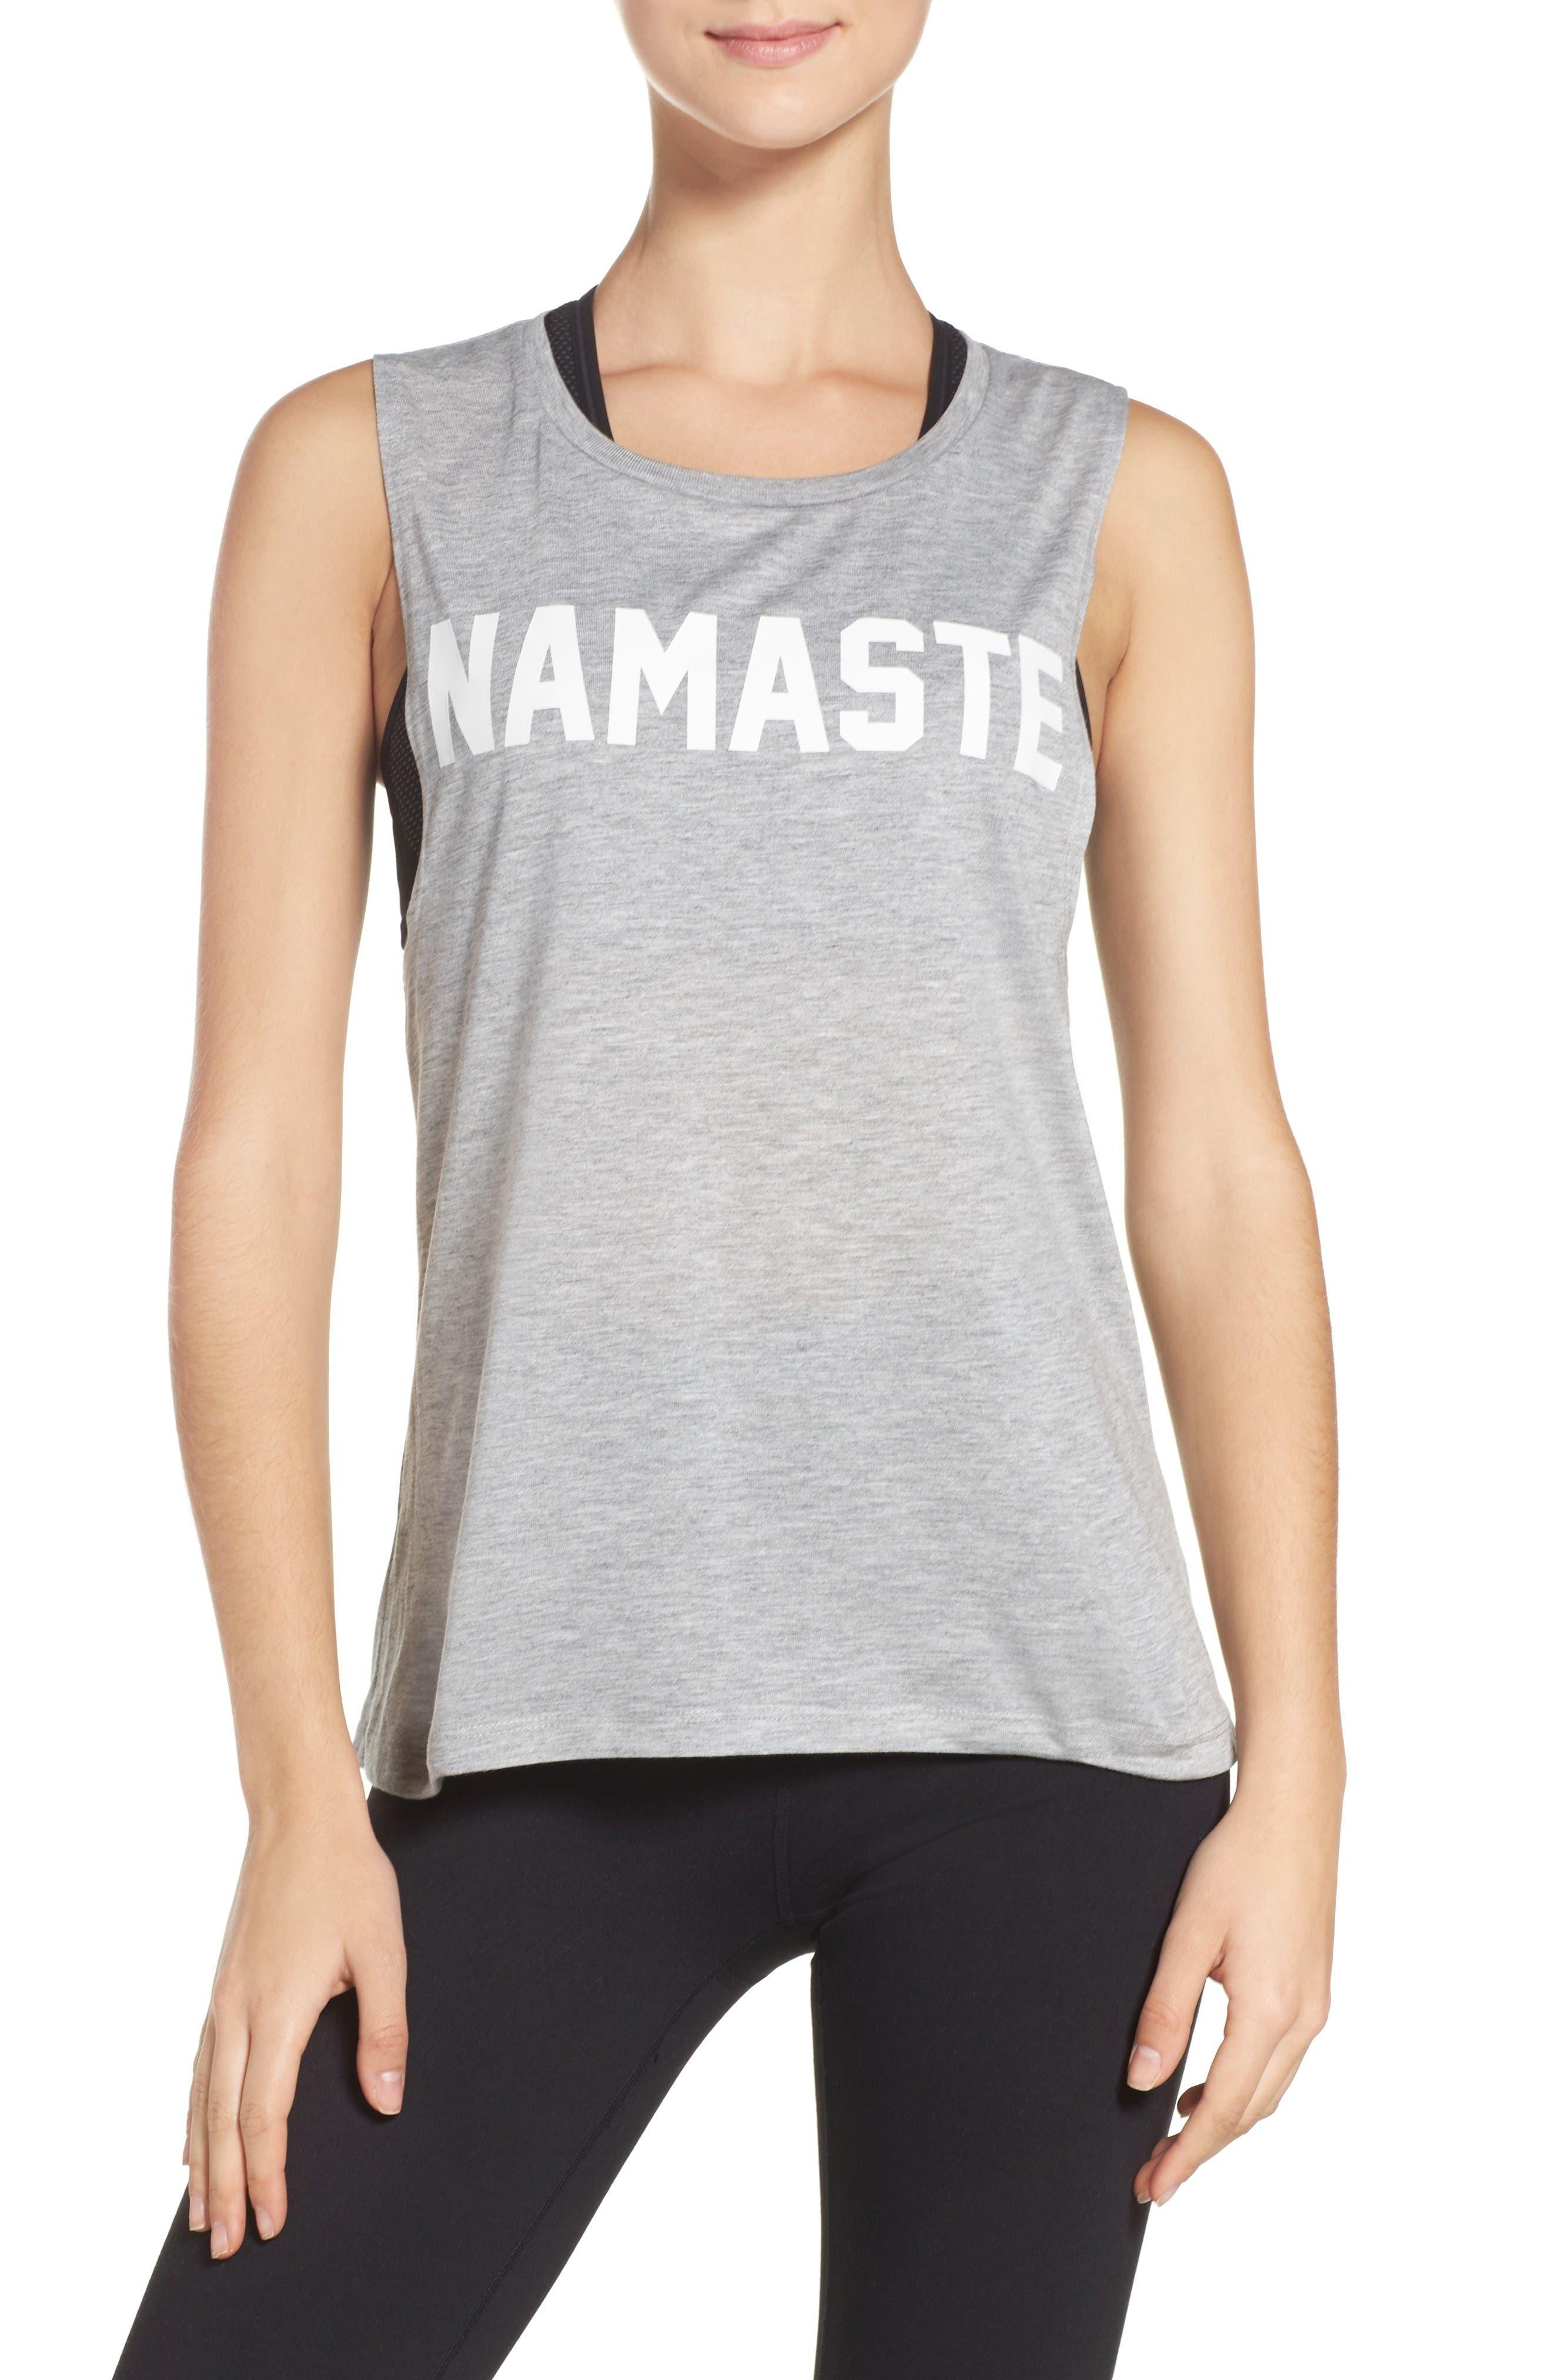 Main Image - Private Party Namaste Tank